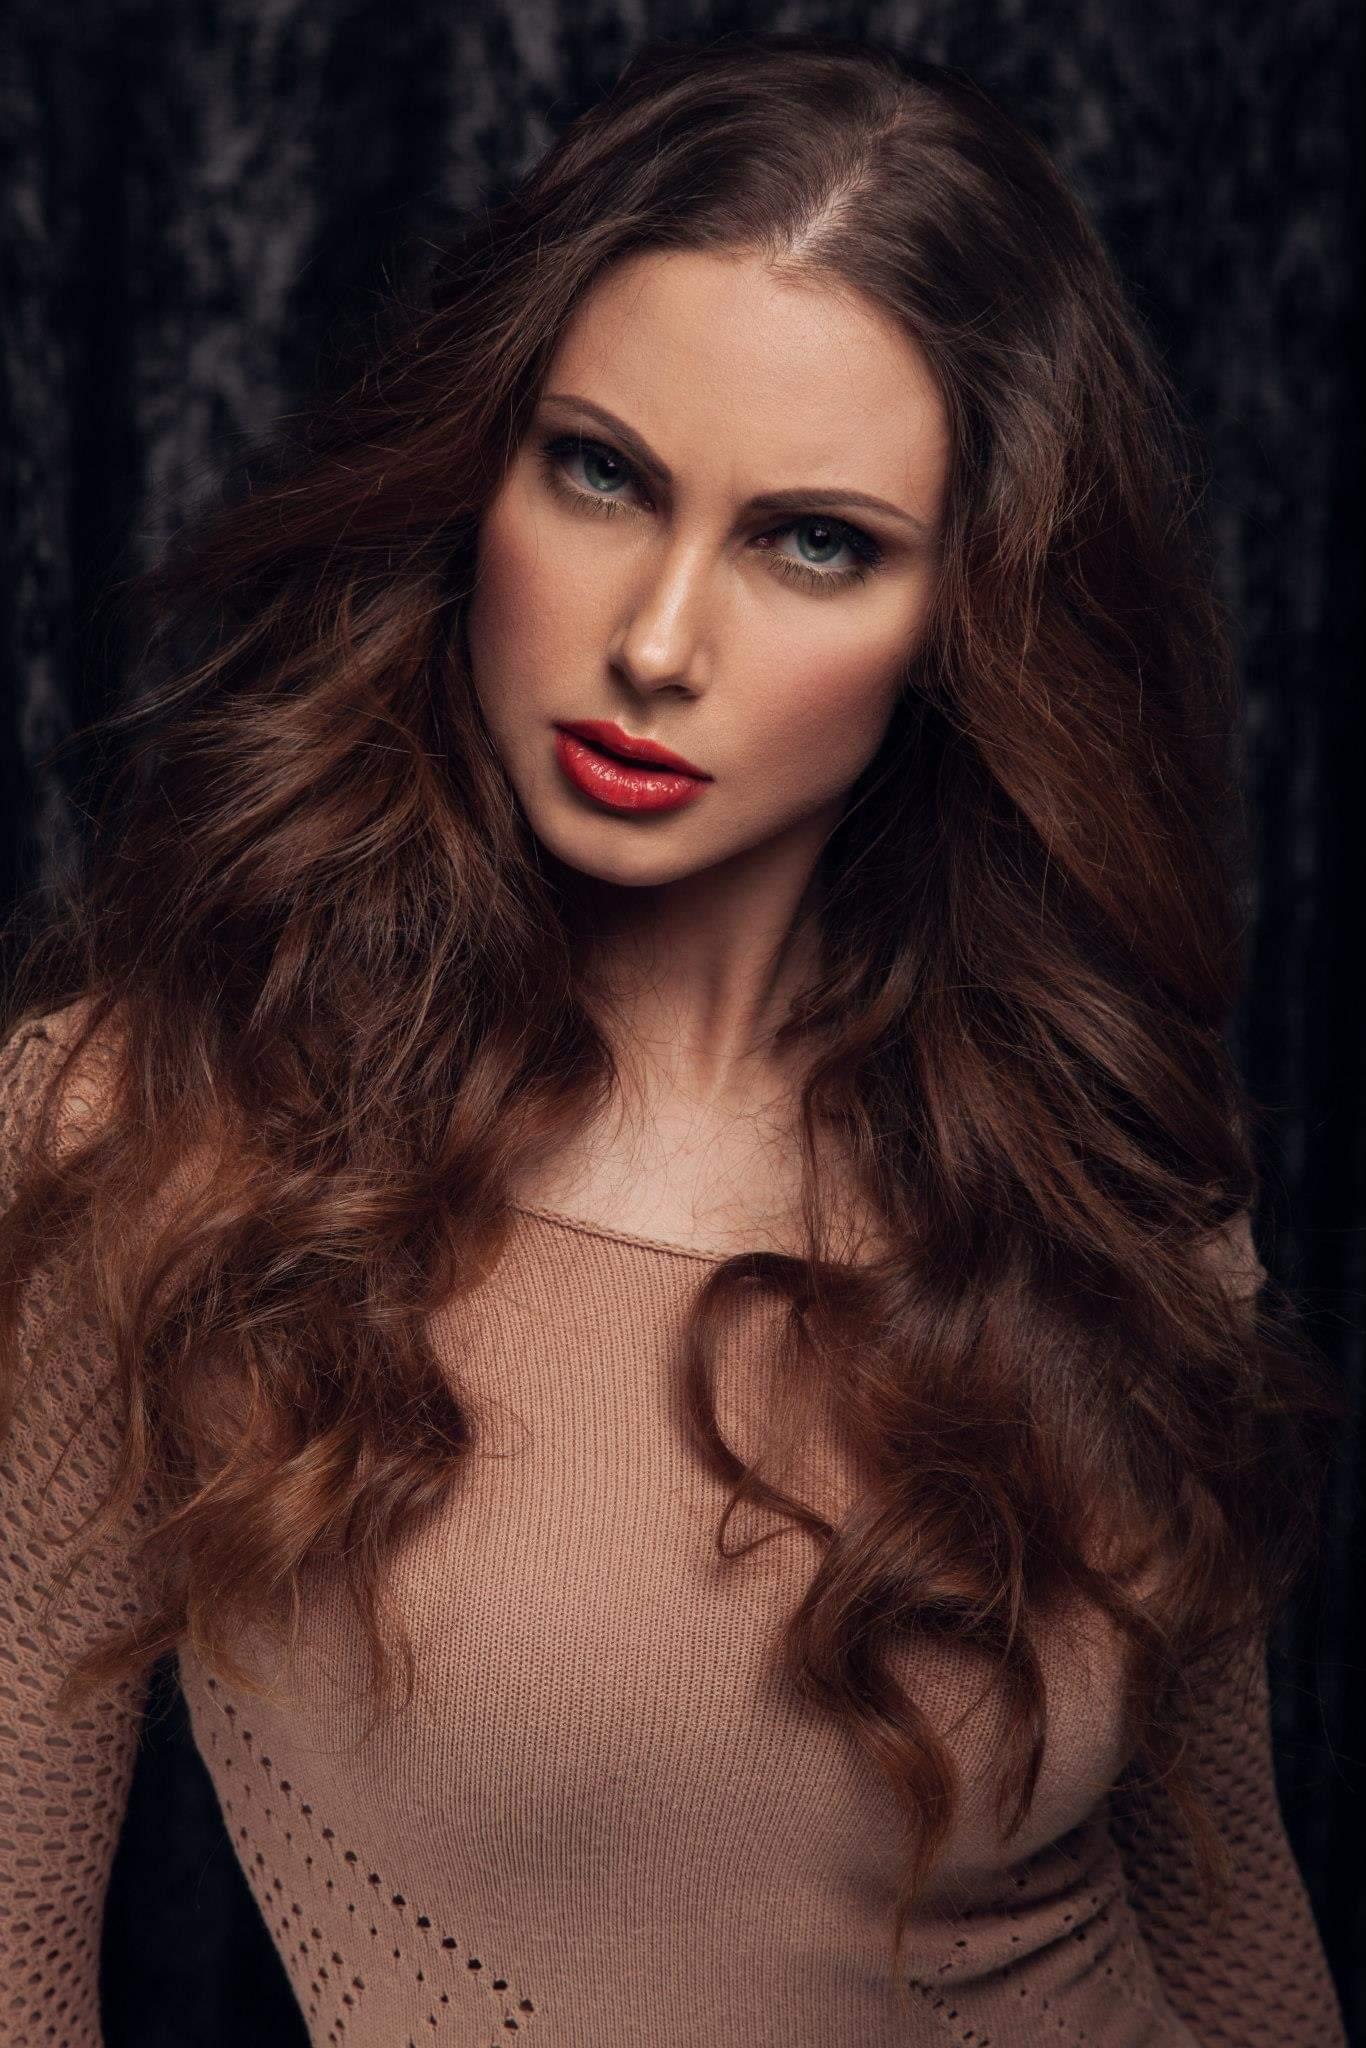 Yana Shtefan